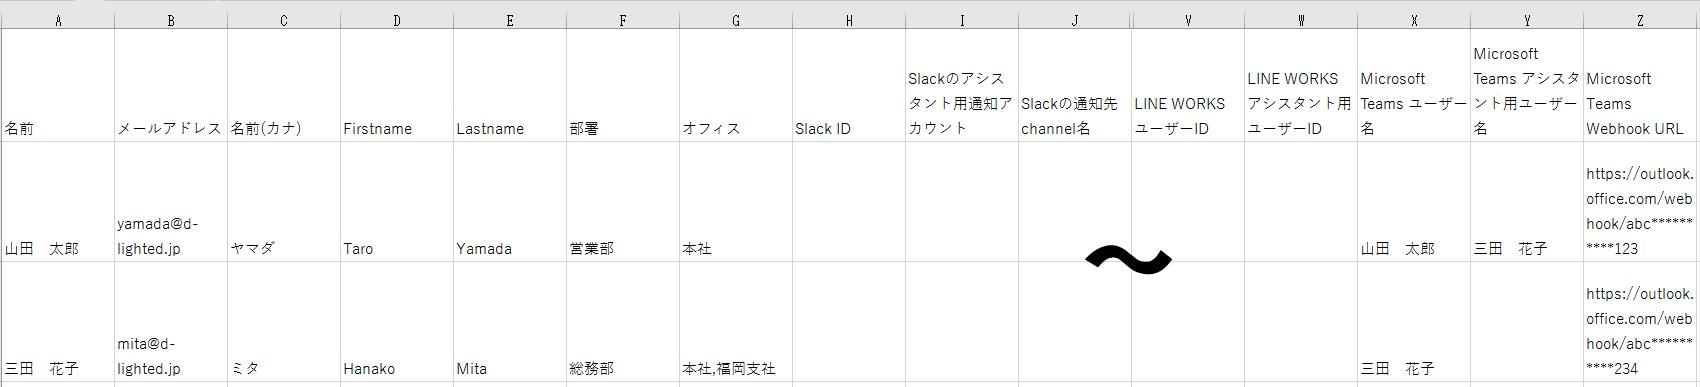 sample_epcsv_teams